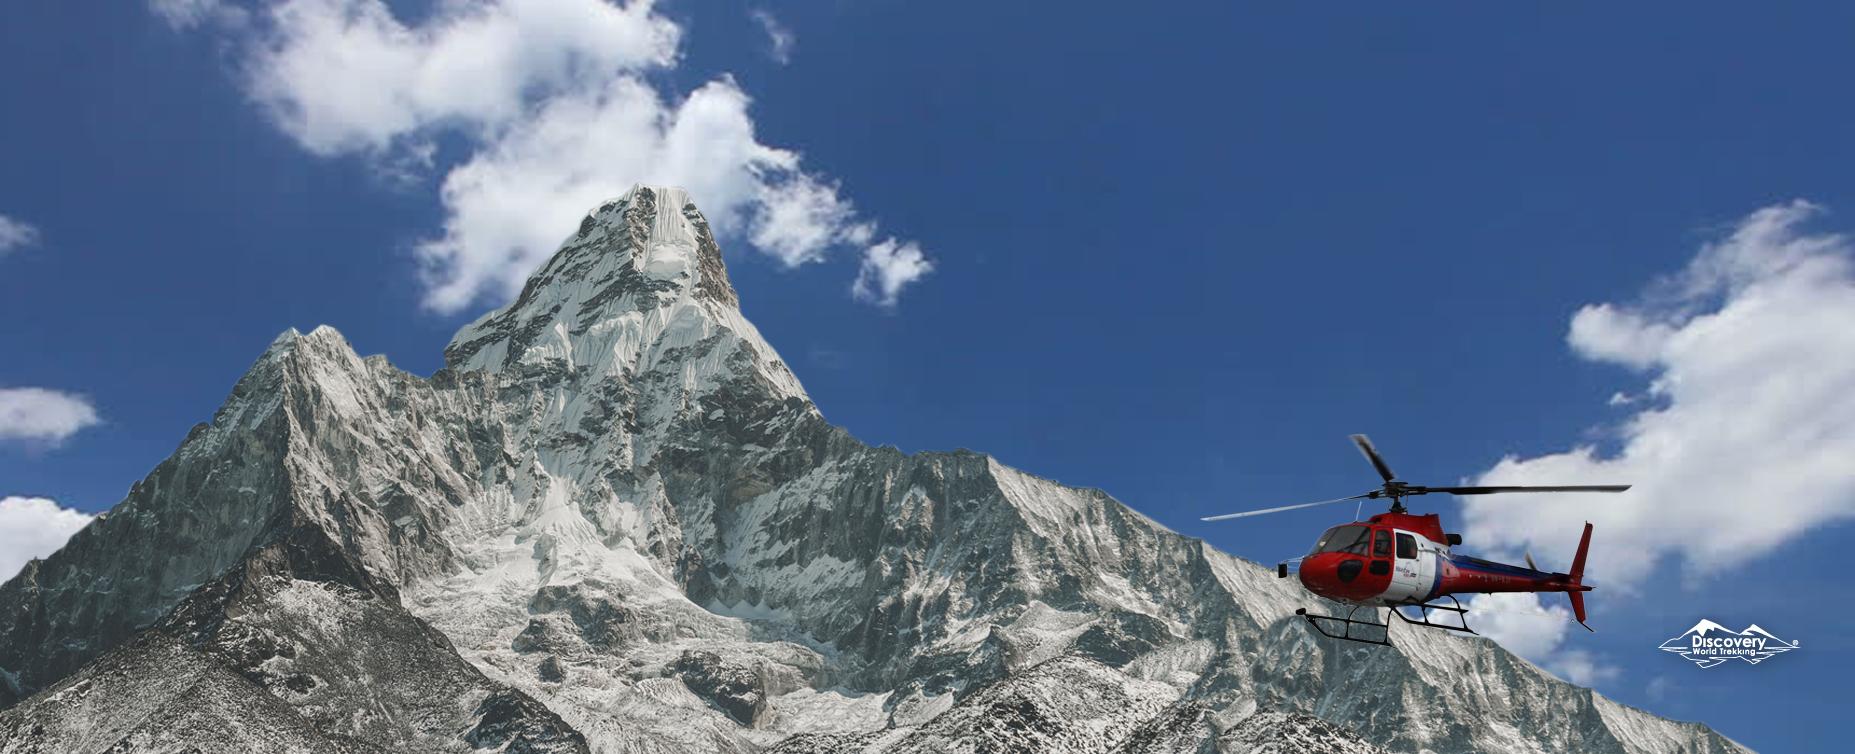 Everest Base Camp Helicopter - 5 Days